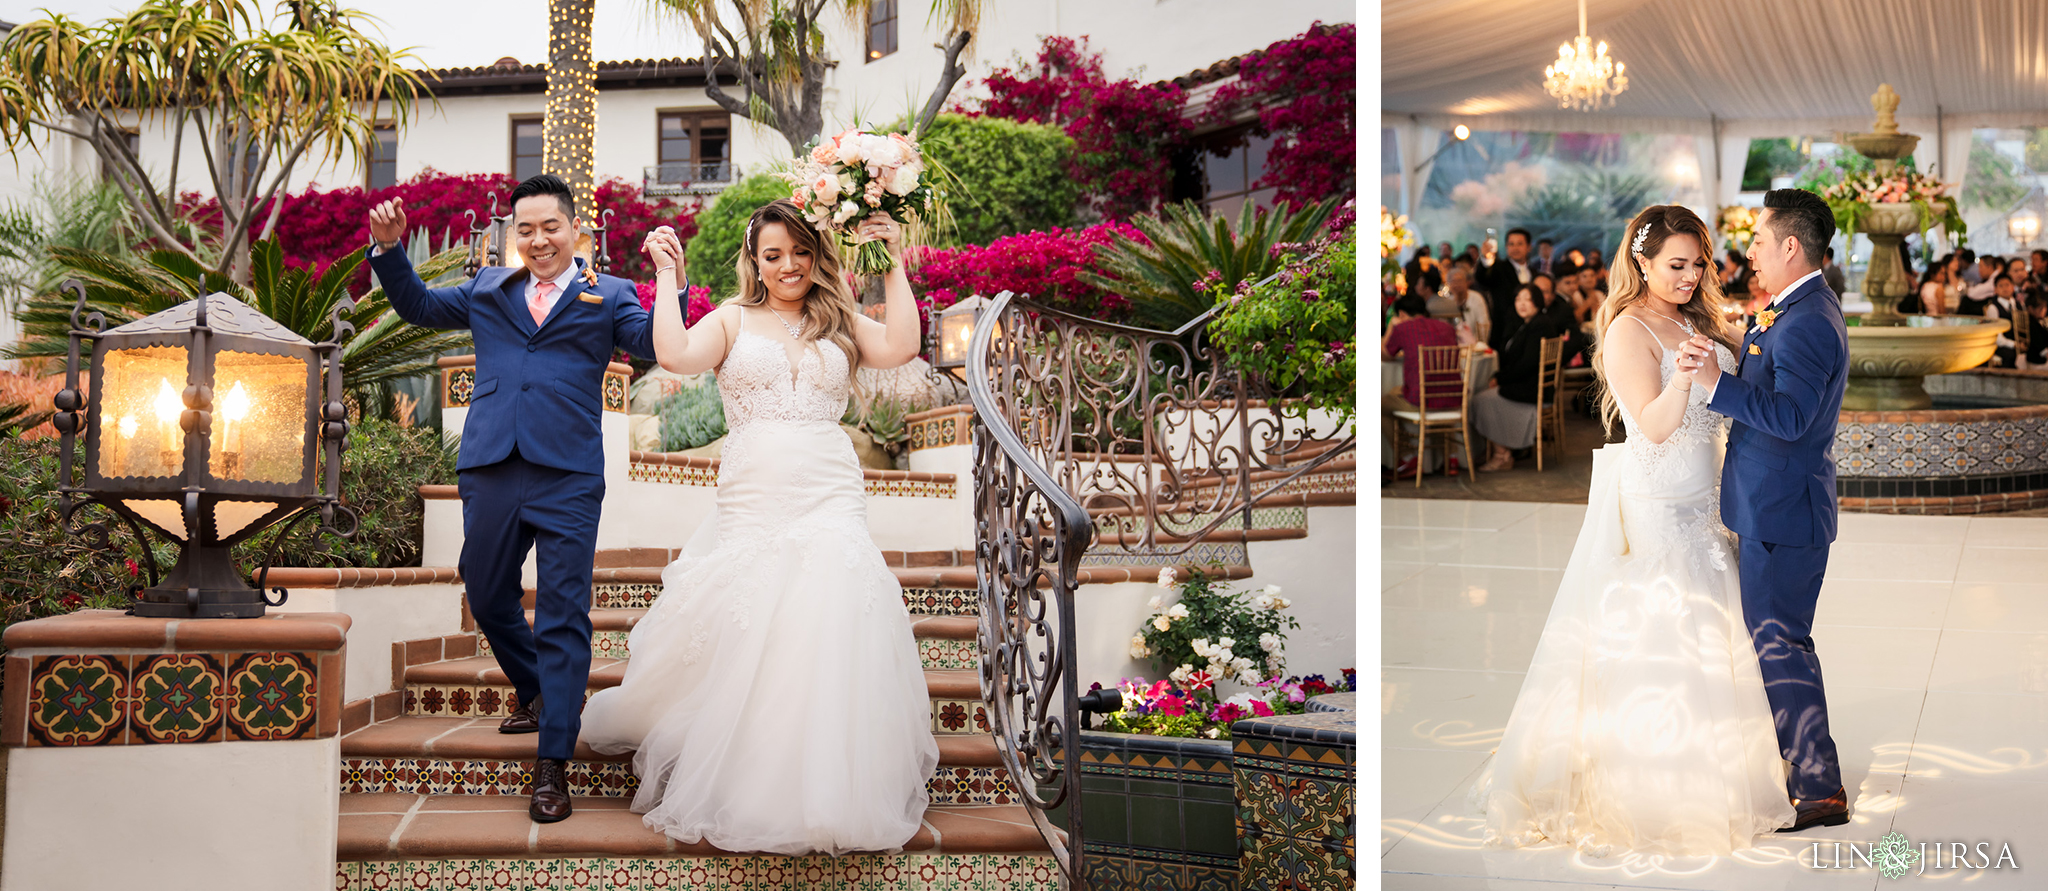 37 Hummingbird Nest Ranch Santa Susana Wedding Photography